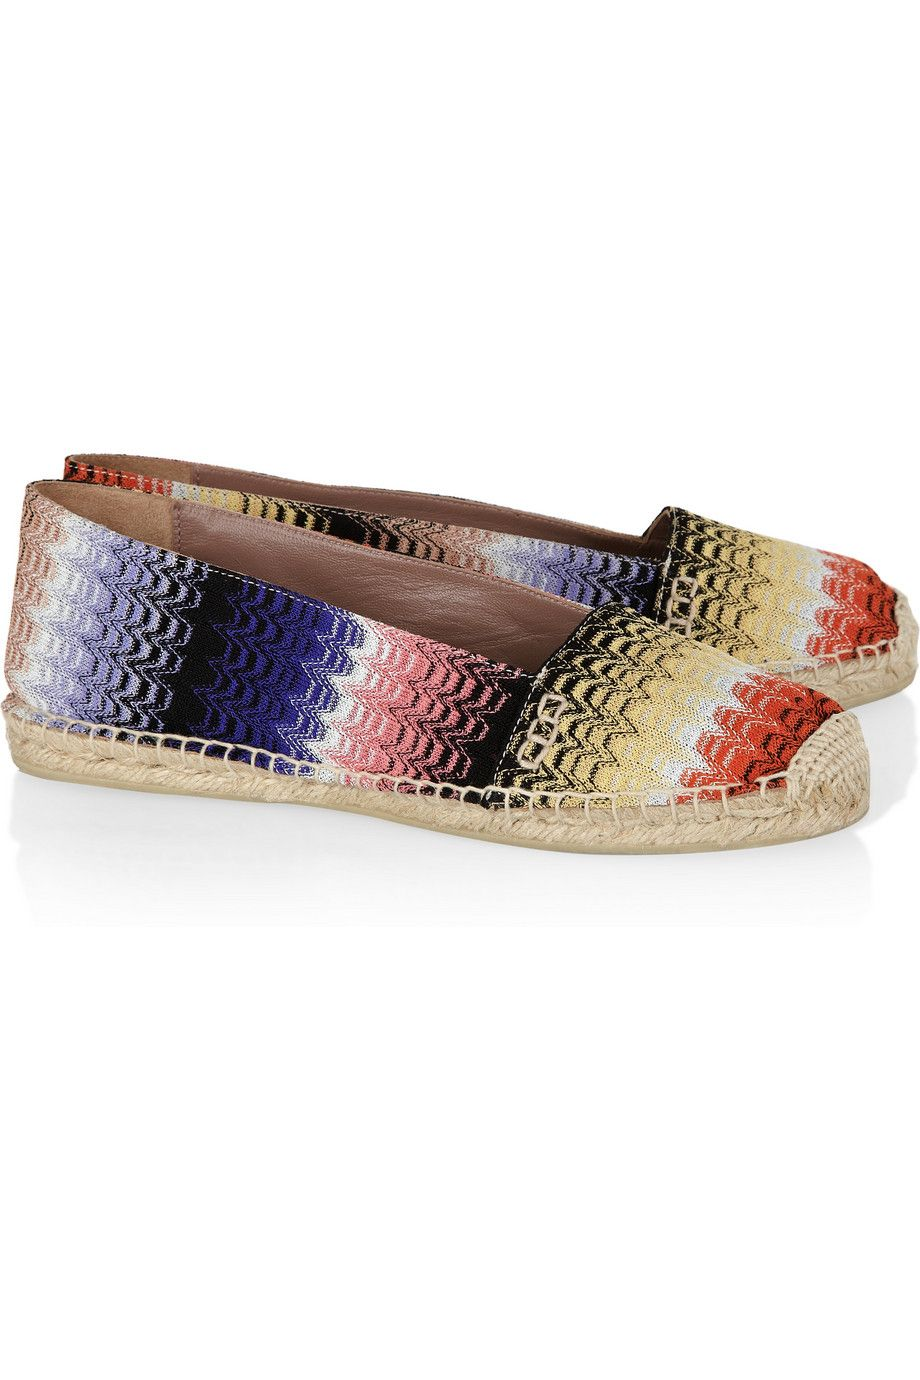 Missoni Woven Espadrilles Flats cheap 2014 sale fashion Style 2014 unisex cheap online discount price mhYanm0